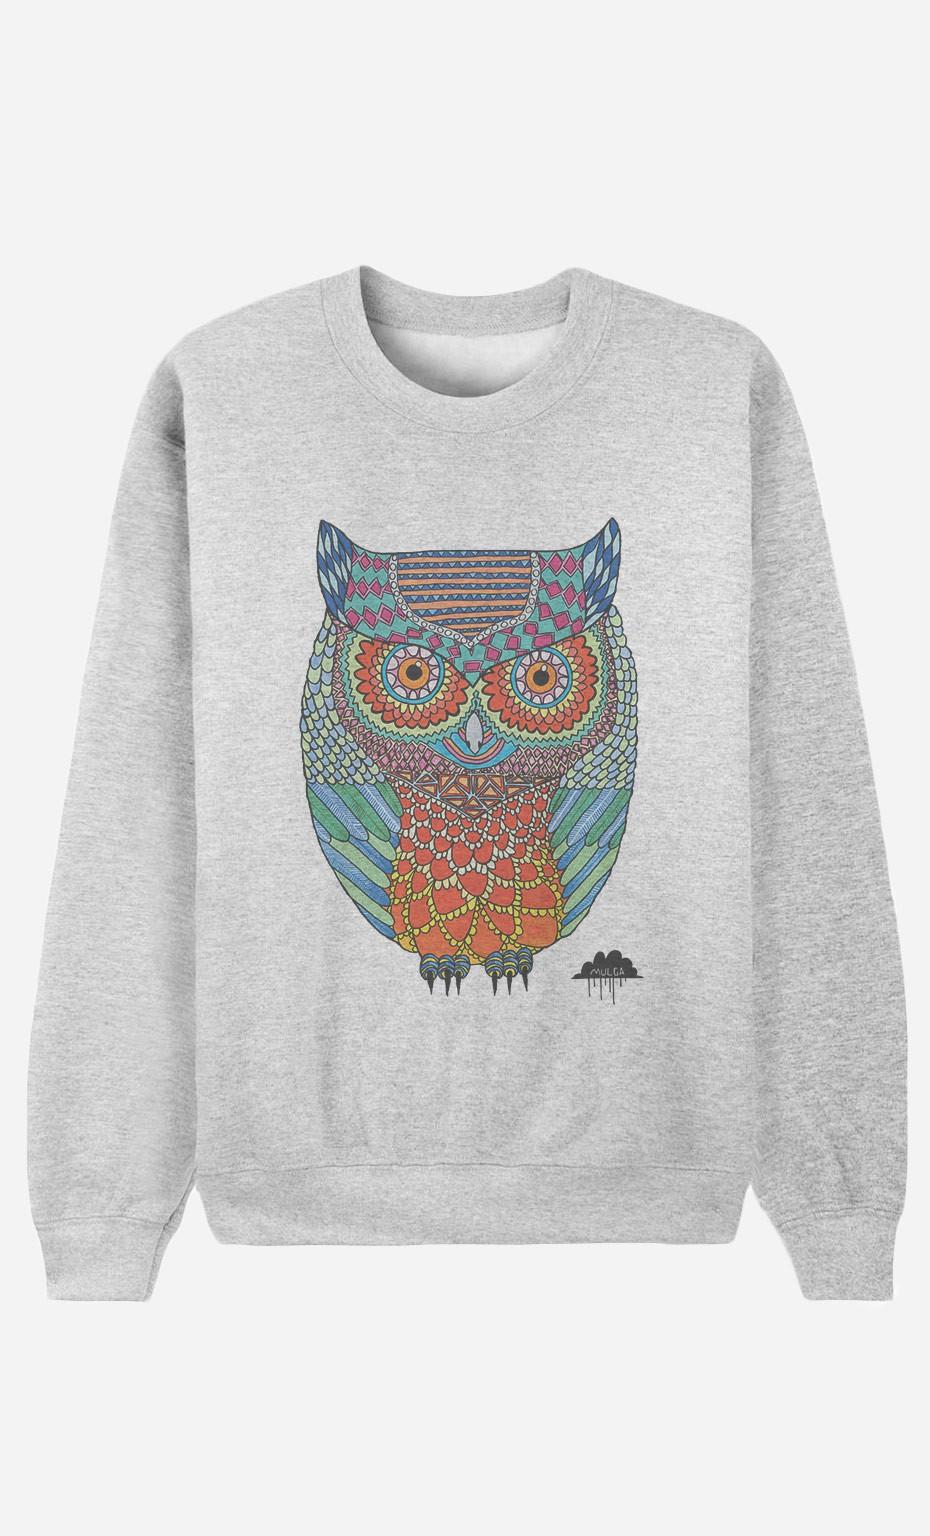 Sweatshirt Ollie The Owl